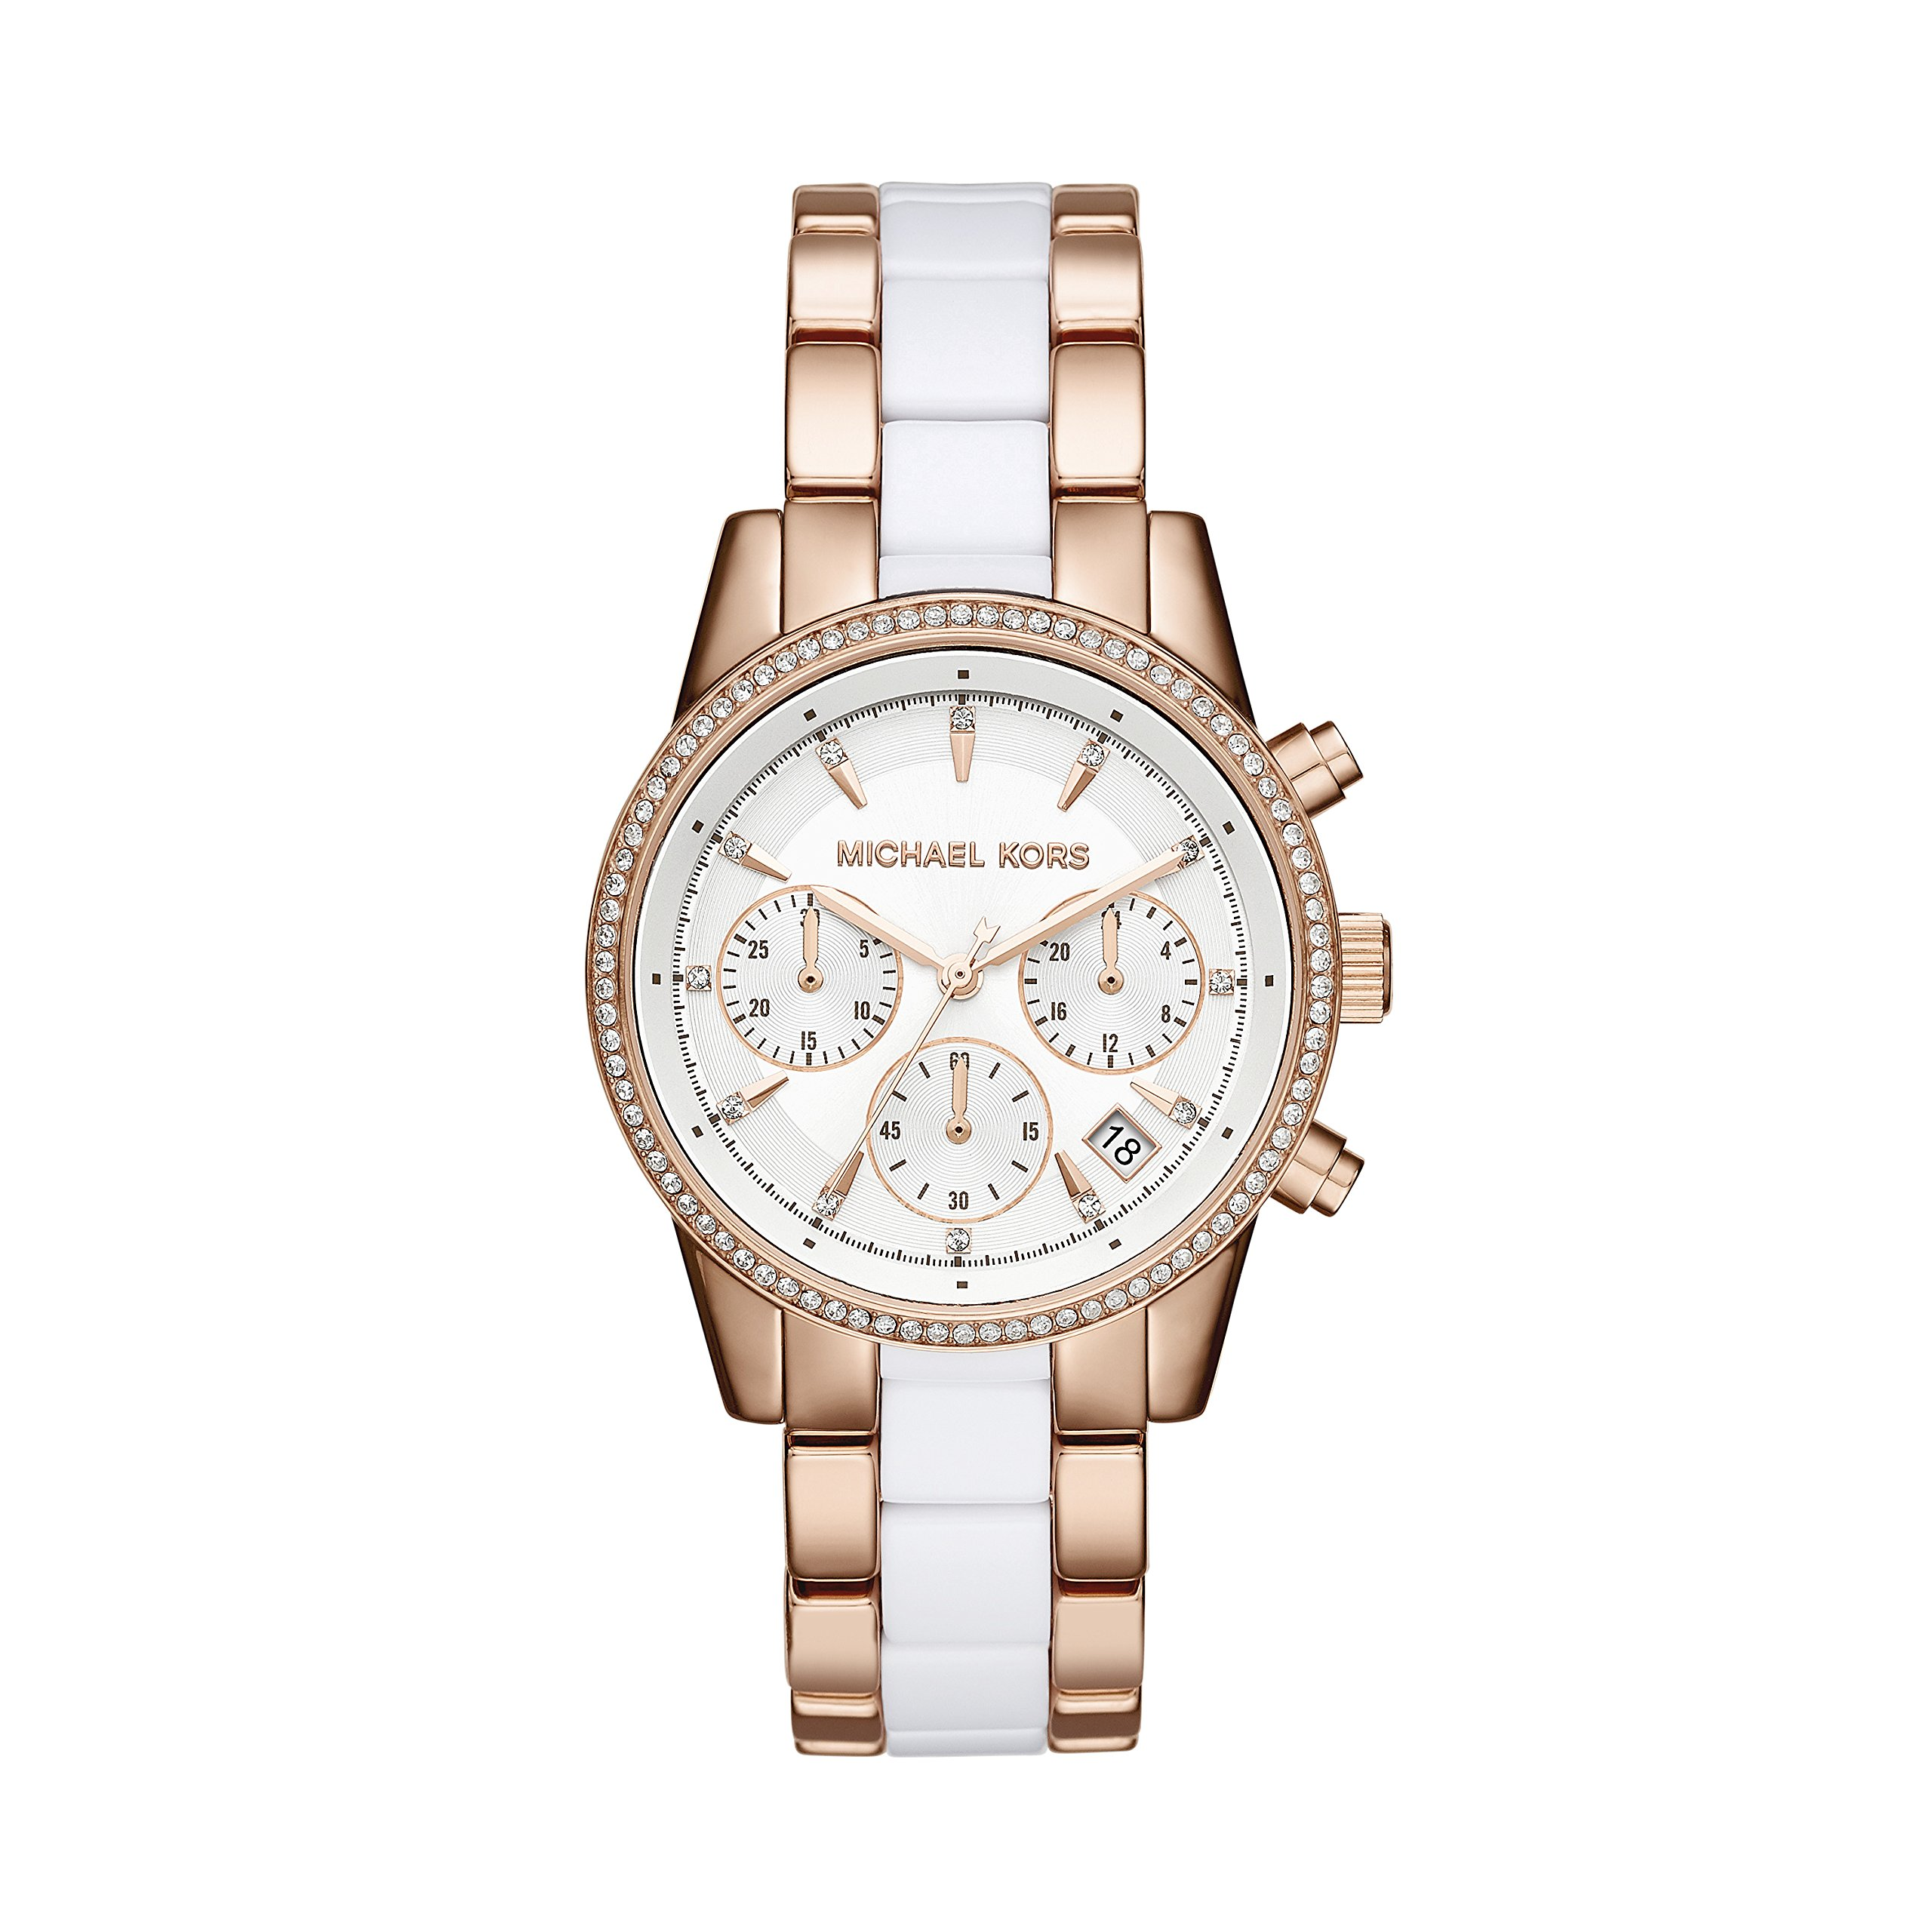 Michael Kors MK6324 Ladies Ritz Rose and White Chronograph Watch by Michael Kors